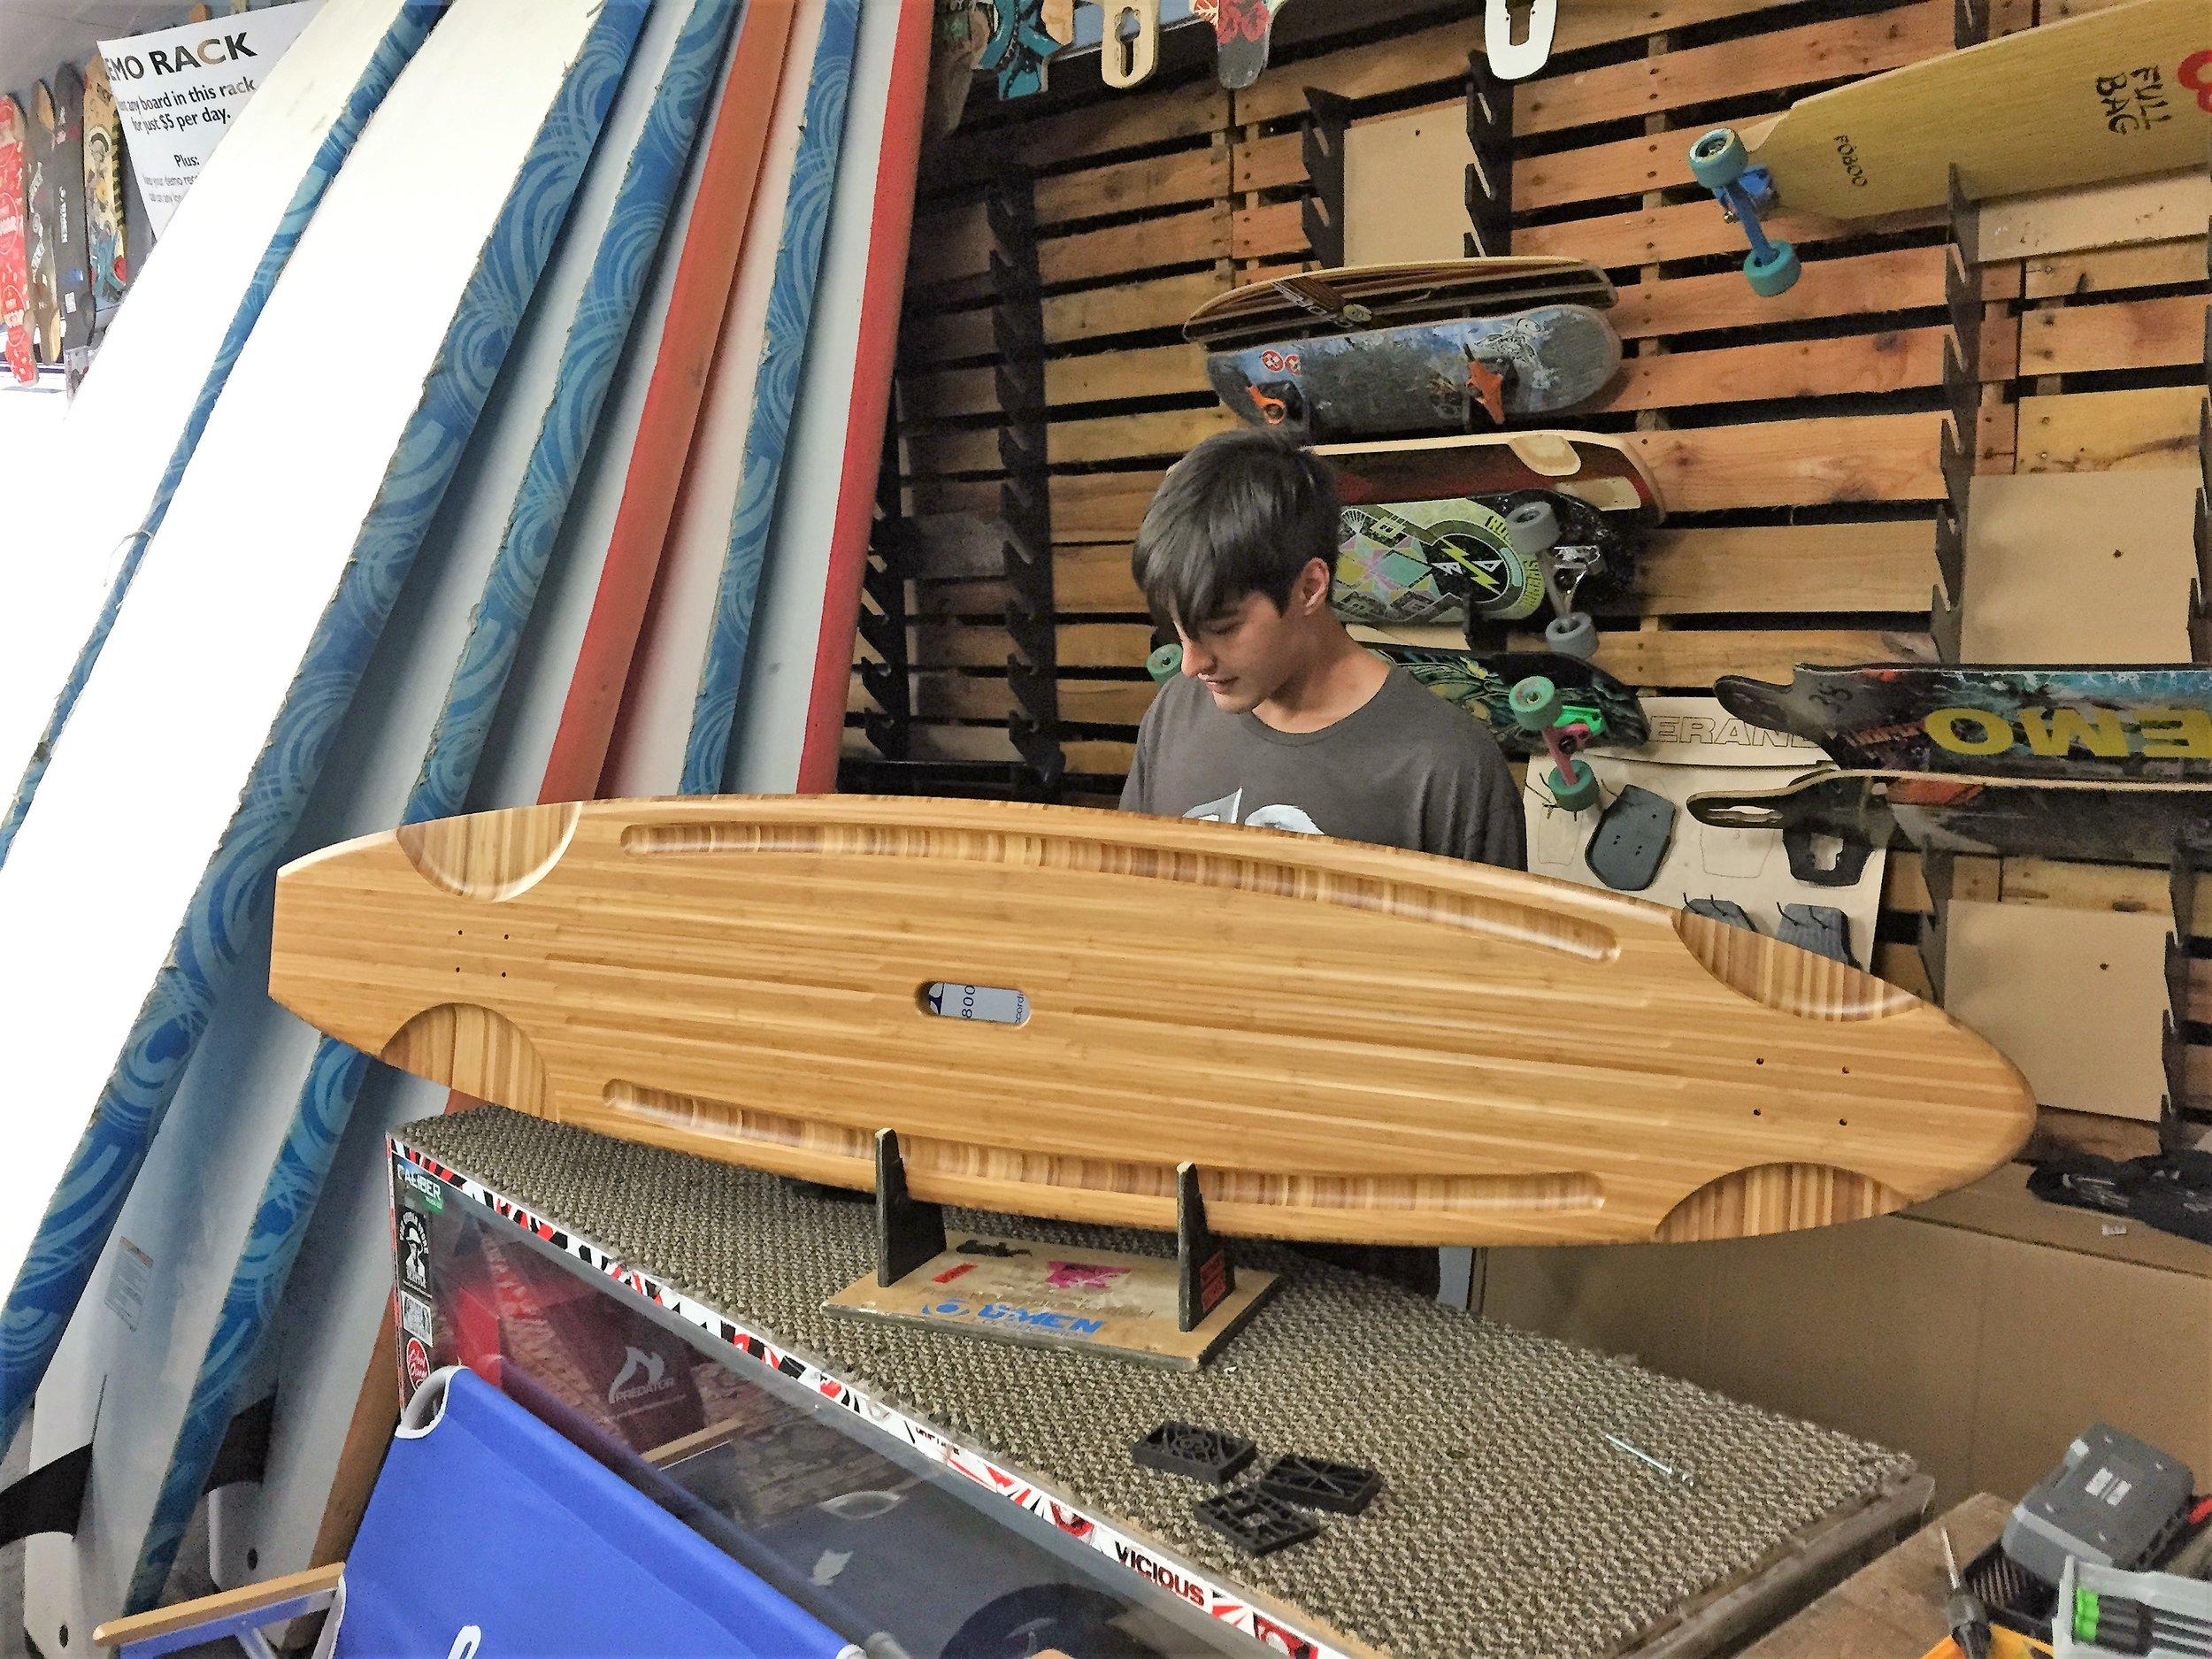 Oberand 6 foot Board.JPG